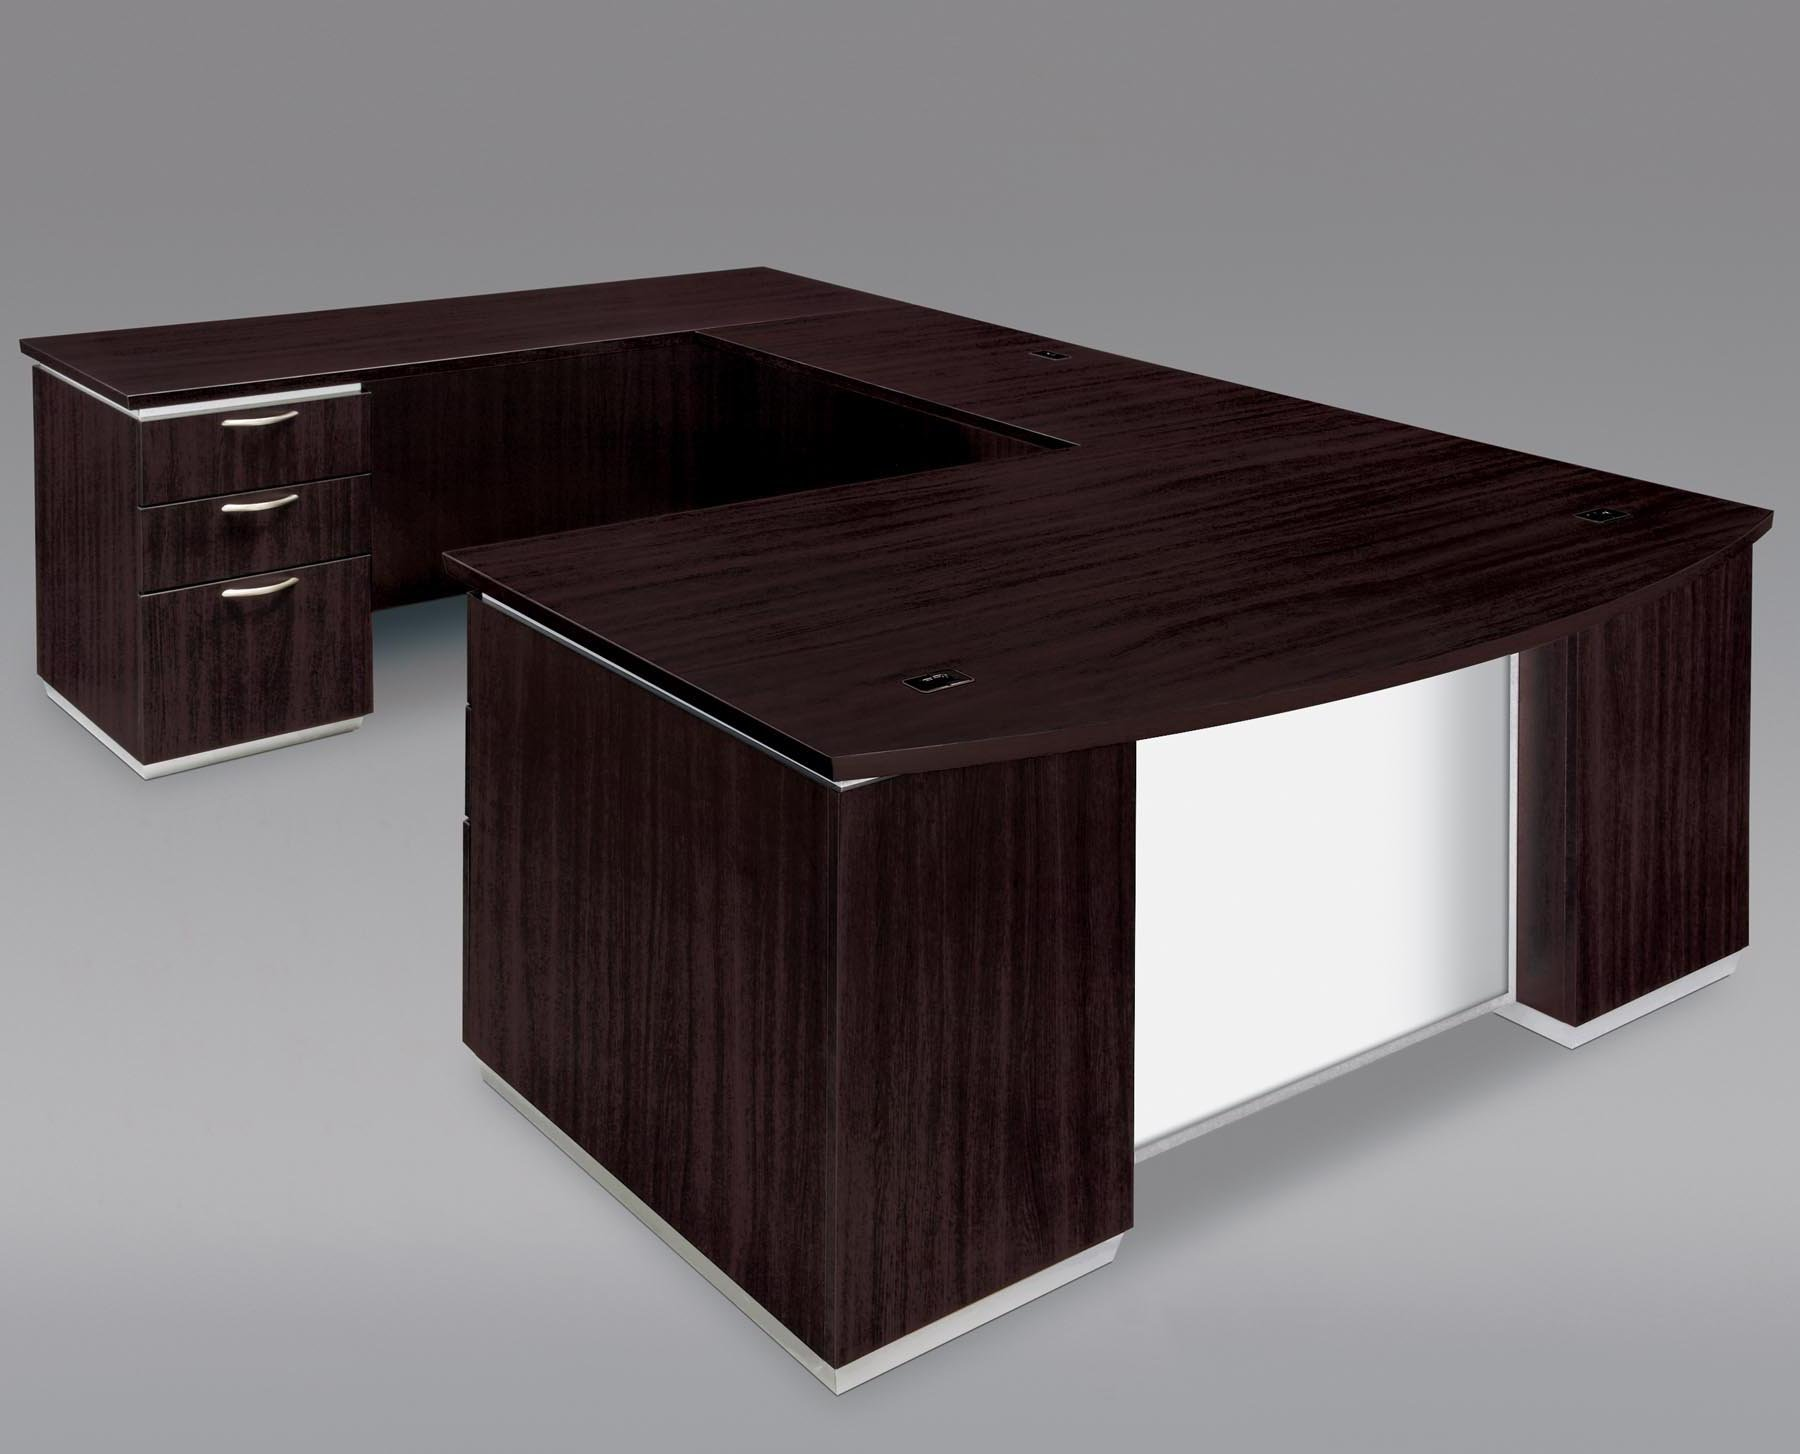 Model: 7020-58BWG | Flexsteel Pimlico  Left Executive Bow Front U Desk with White Glass Modesty Panel